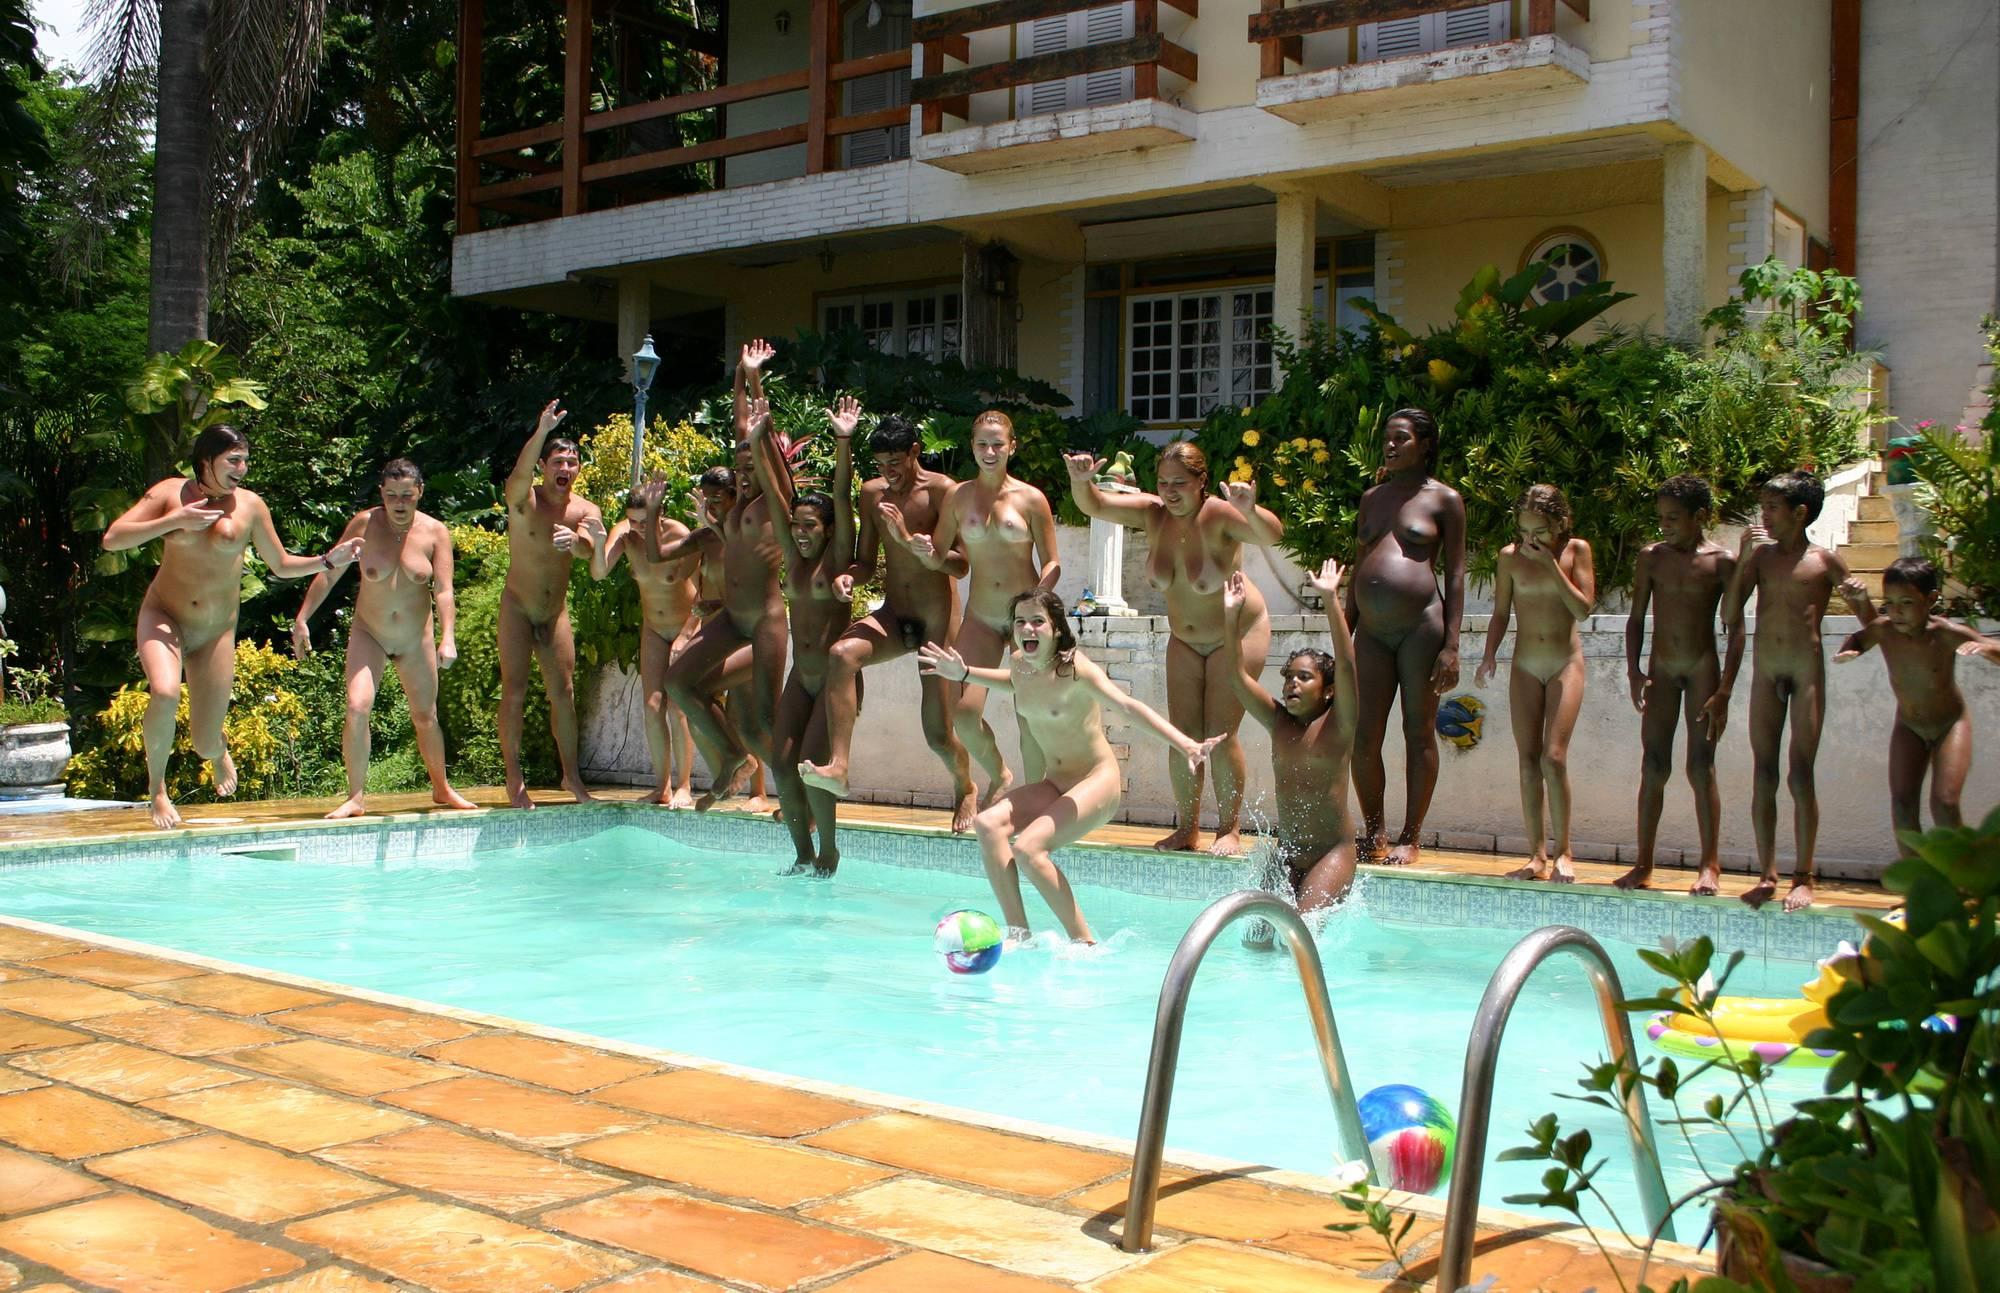 Brazilian Pool Wall Lineup - 1